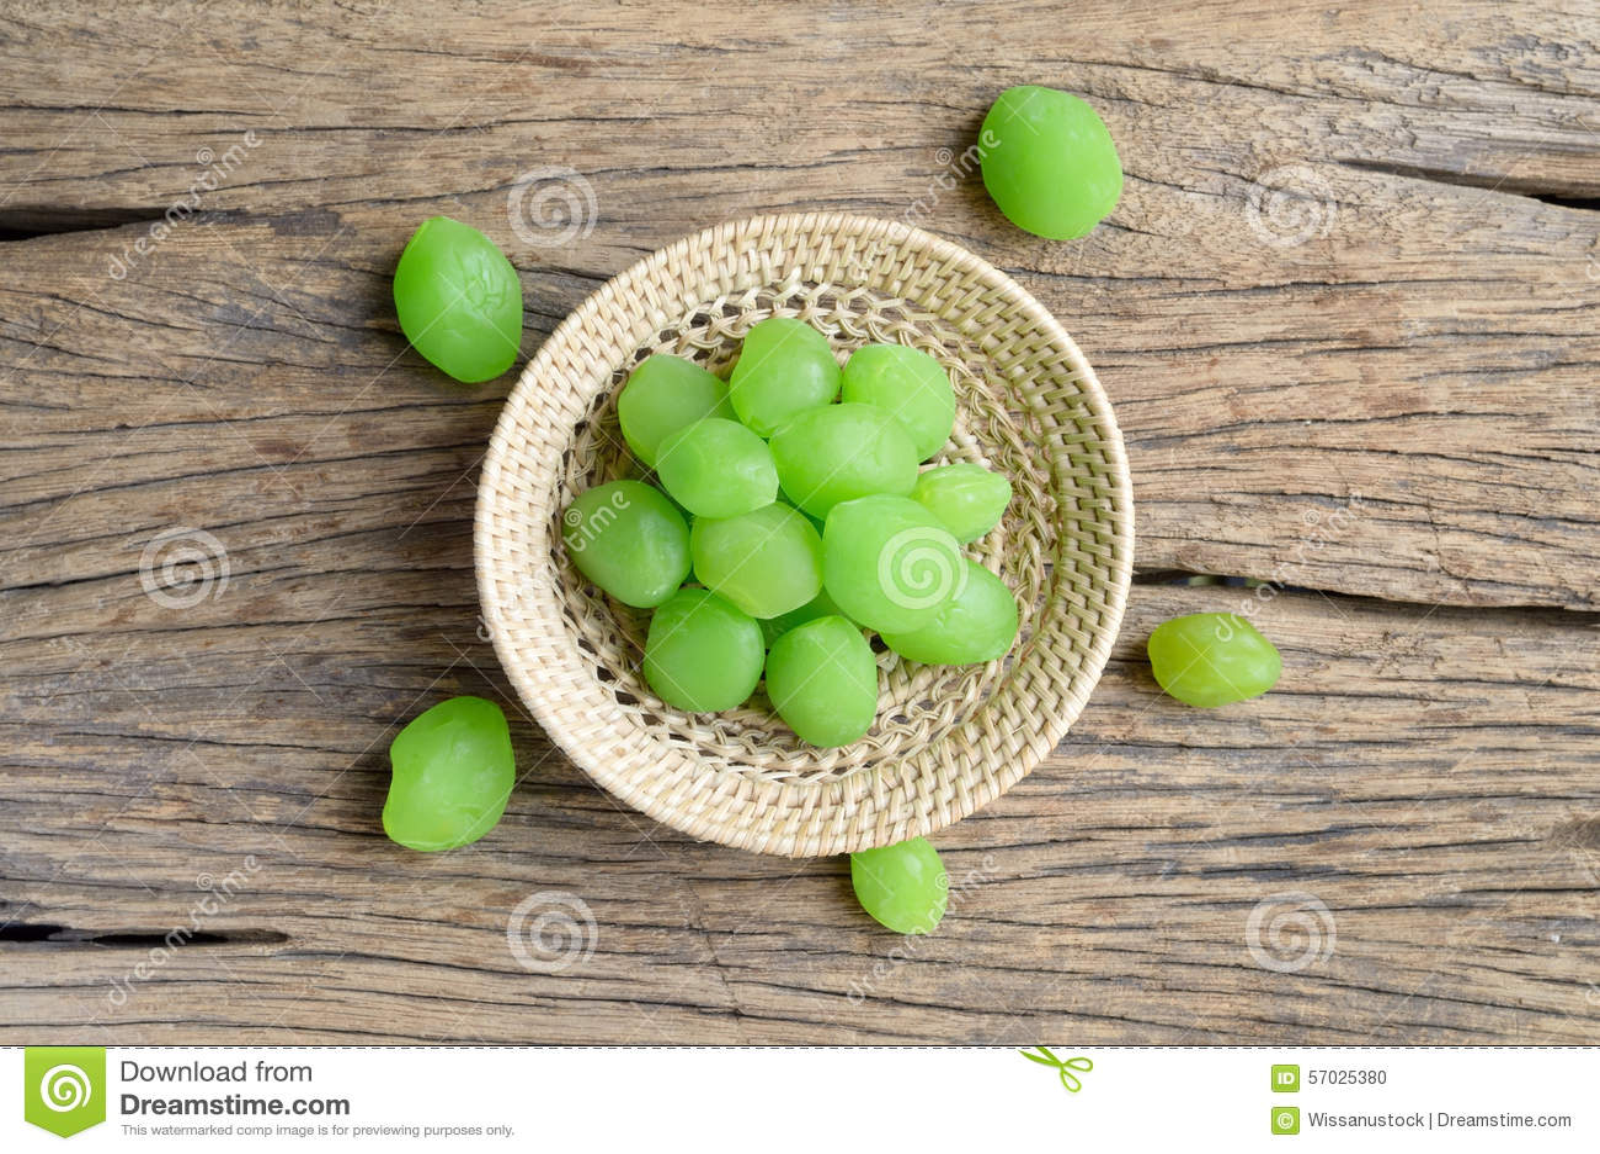 Pickle Making Business Plan Sample Template For Entrepreneurs